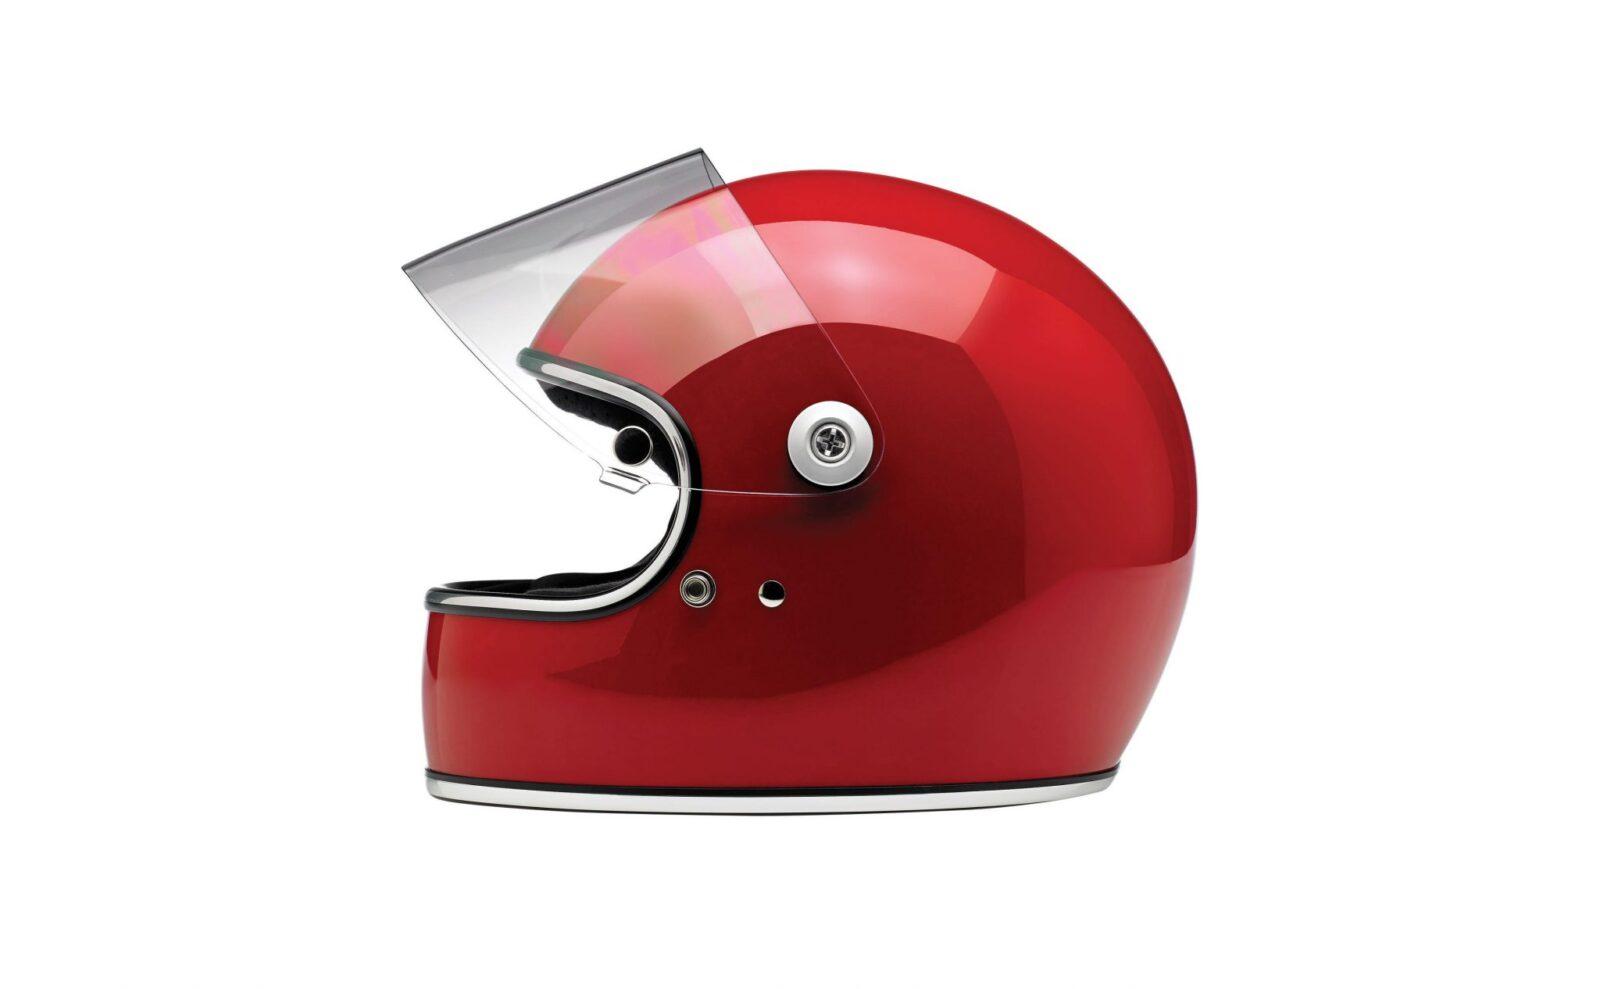 Biltwell Gringo S Helmet 1600x989 - The Retrotastic Biltwell Gringo S Helmet